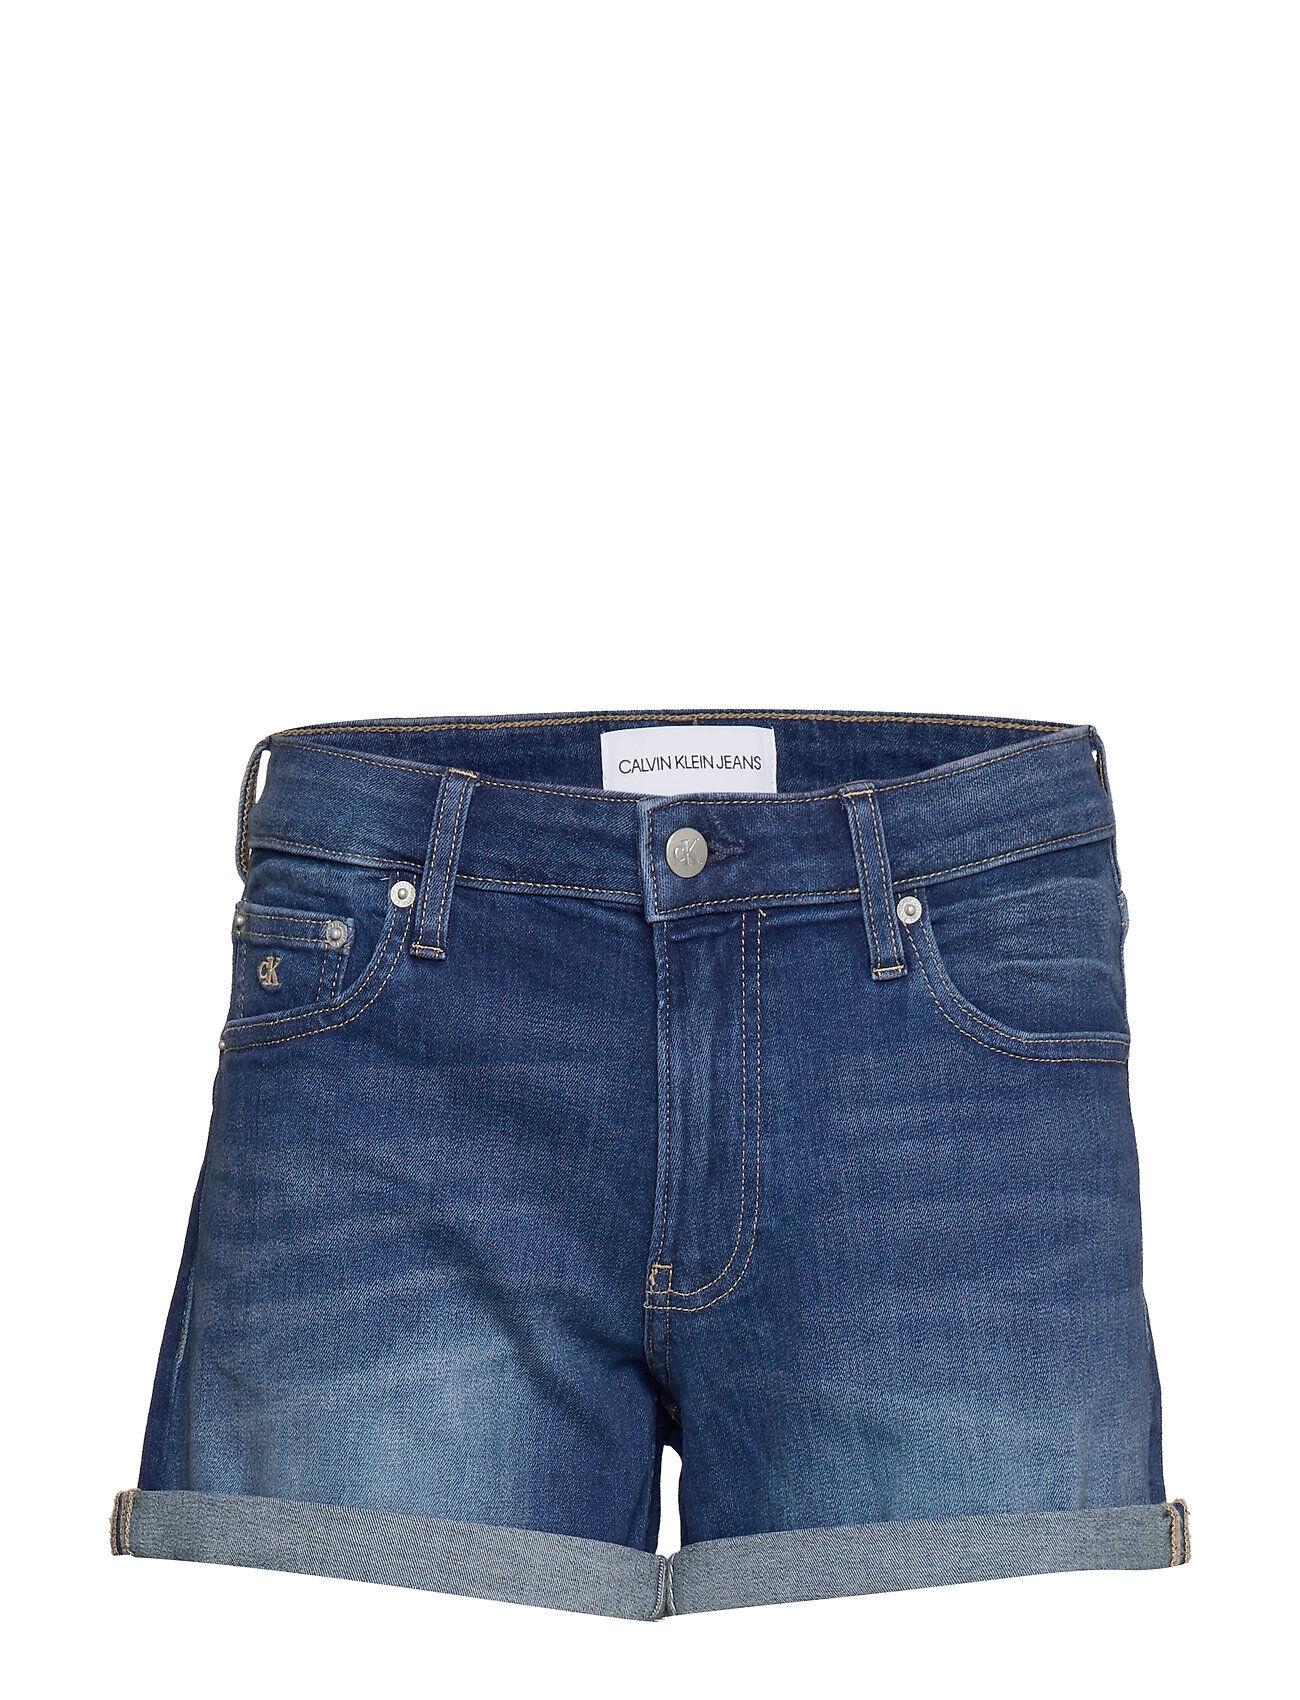 Image of Calvin Mid Rise Short Shorts Denim Shorts Sininen Calvin Klein Jeans